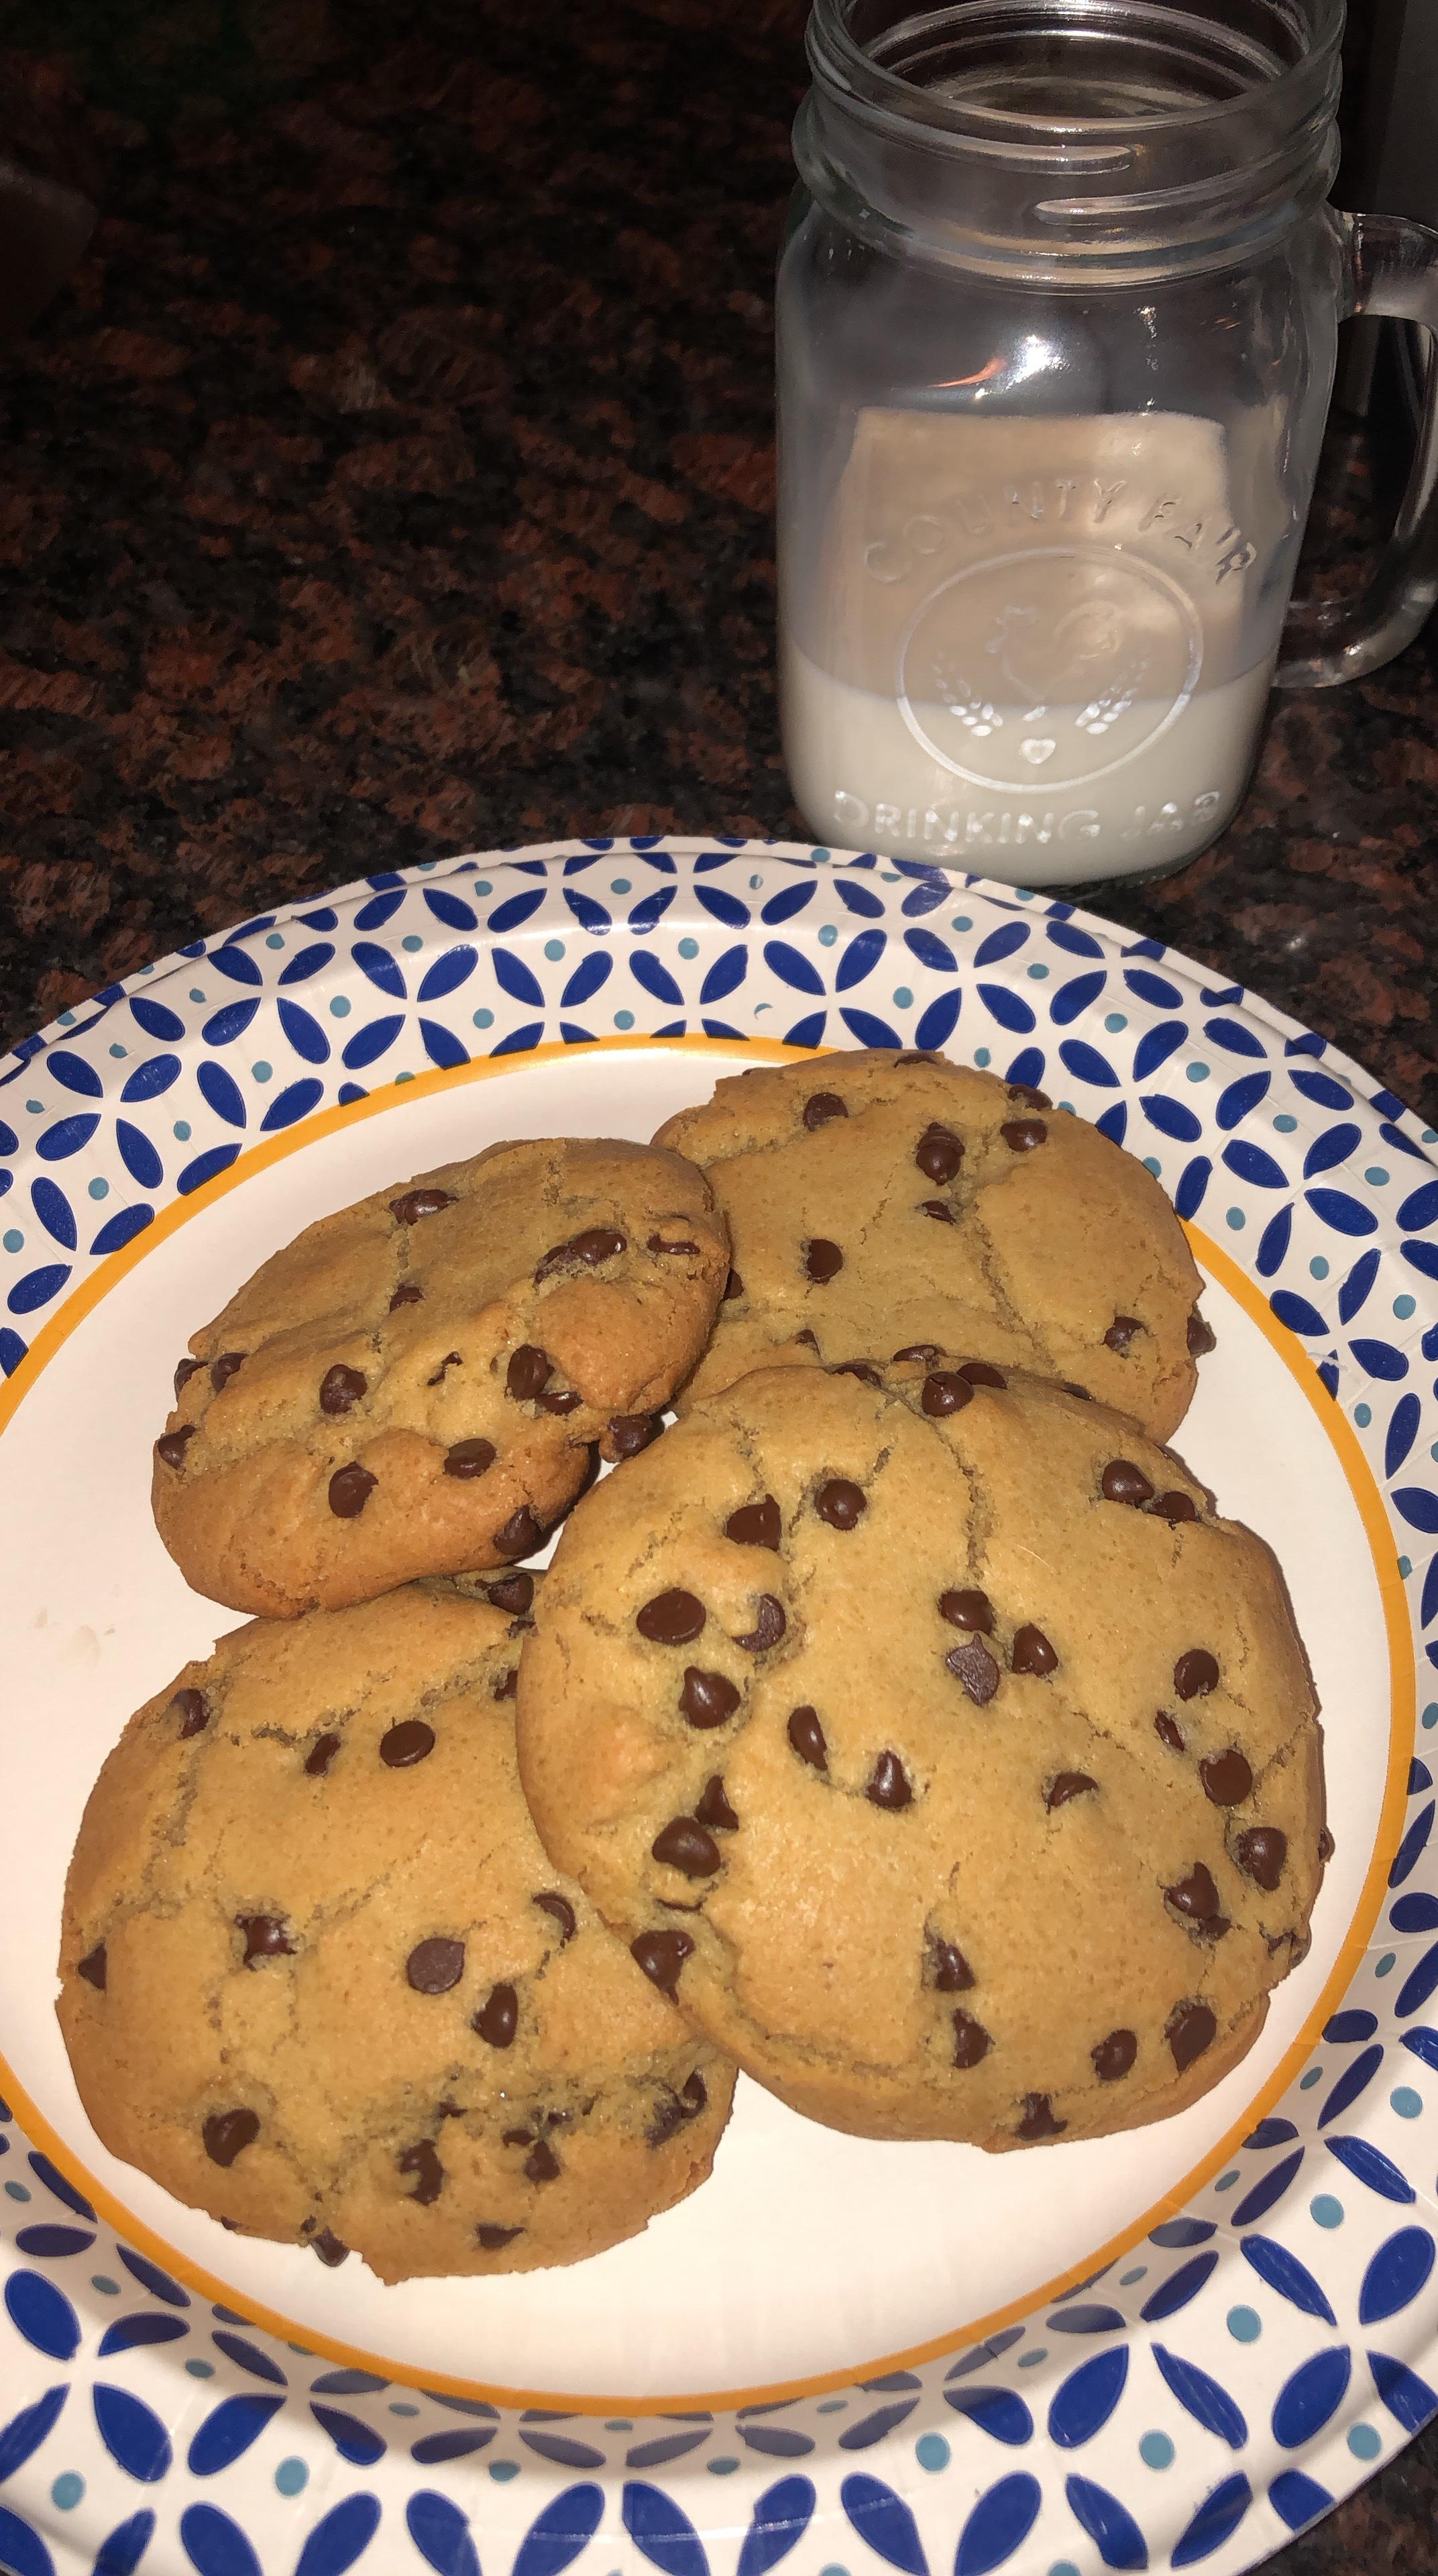 Murt's Man Bait-The Chewiest Most Amazing Chocolate Chip Cookies